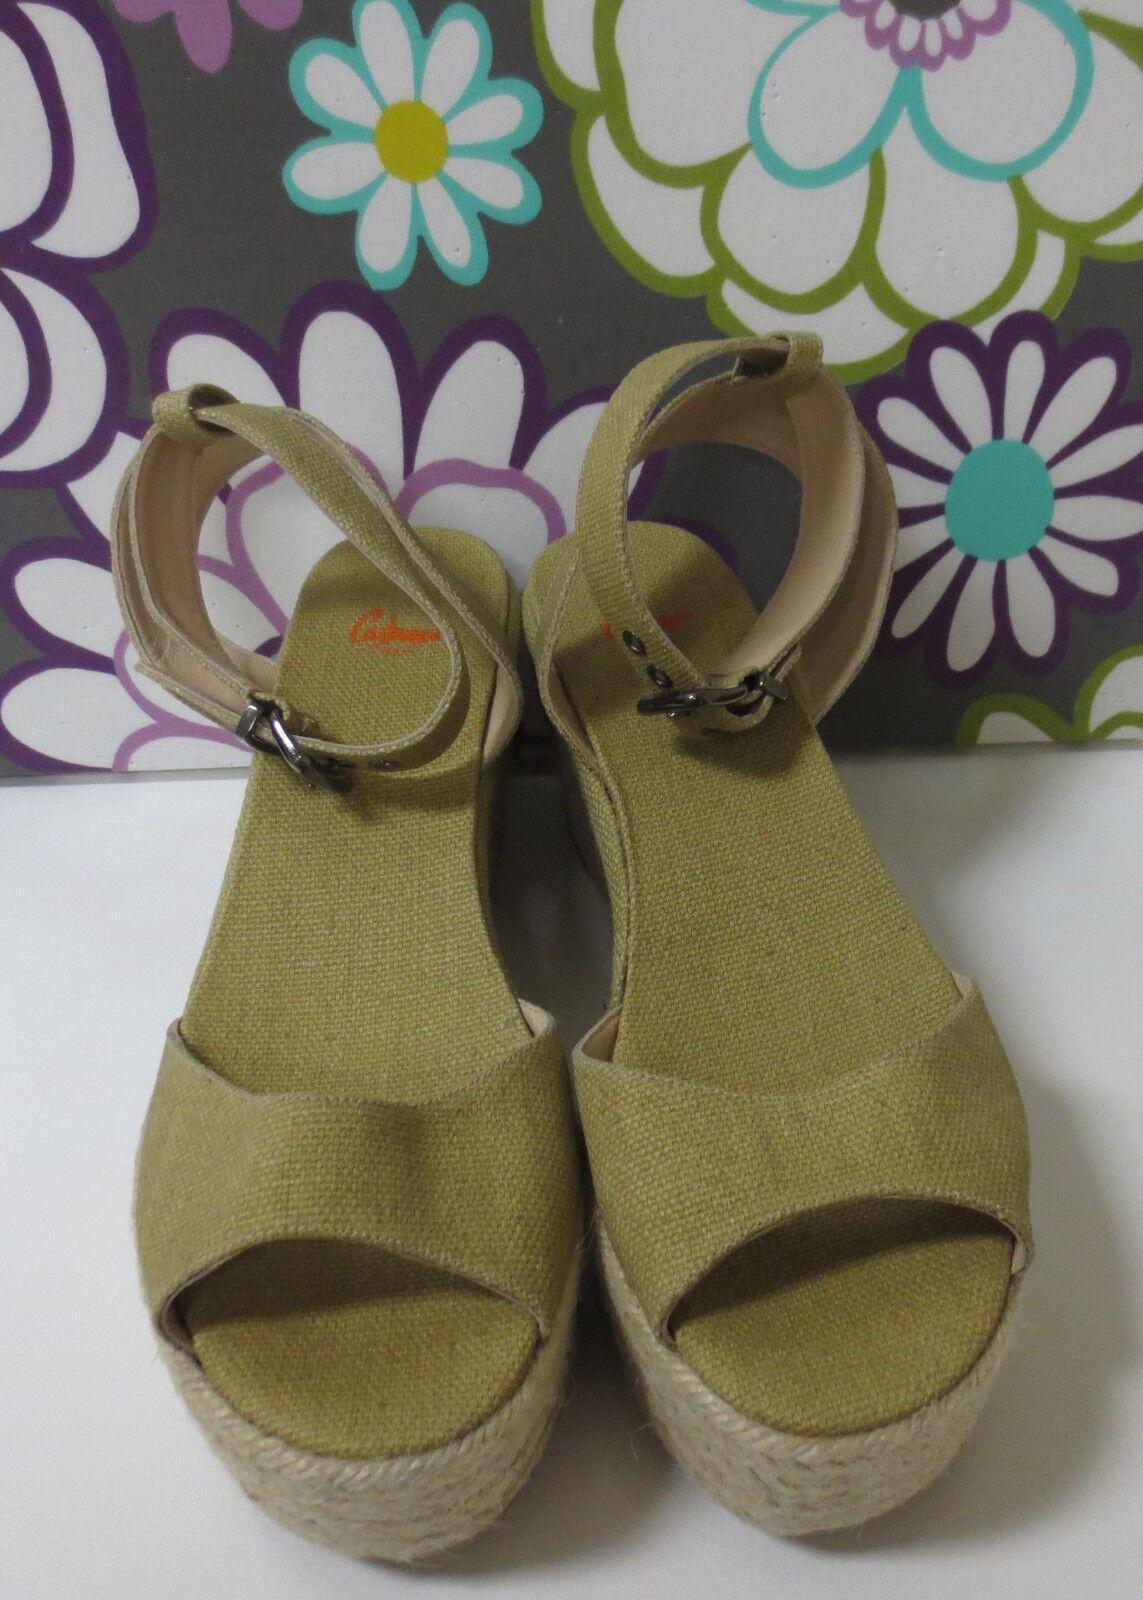 CASTANER Beige Canvas Espadrille Sandals shoes 41 NEW